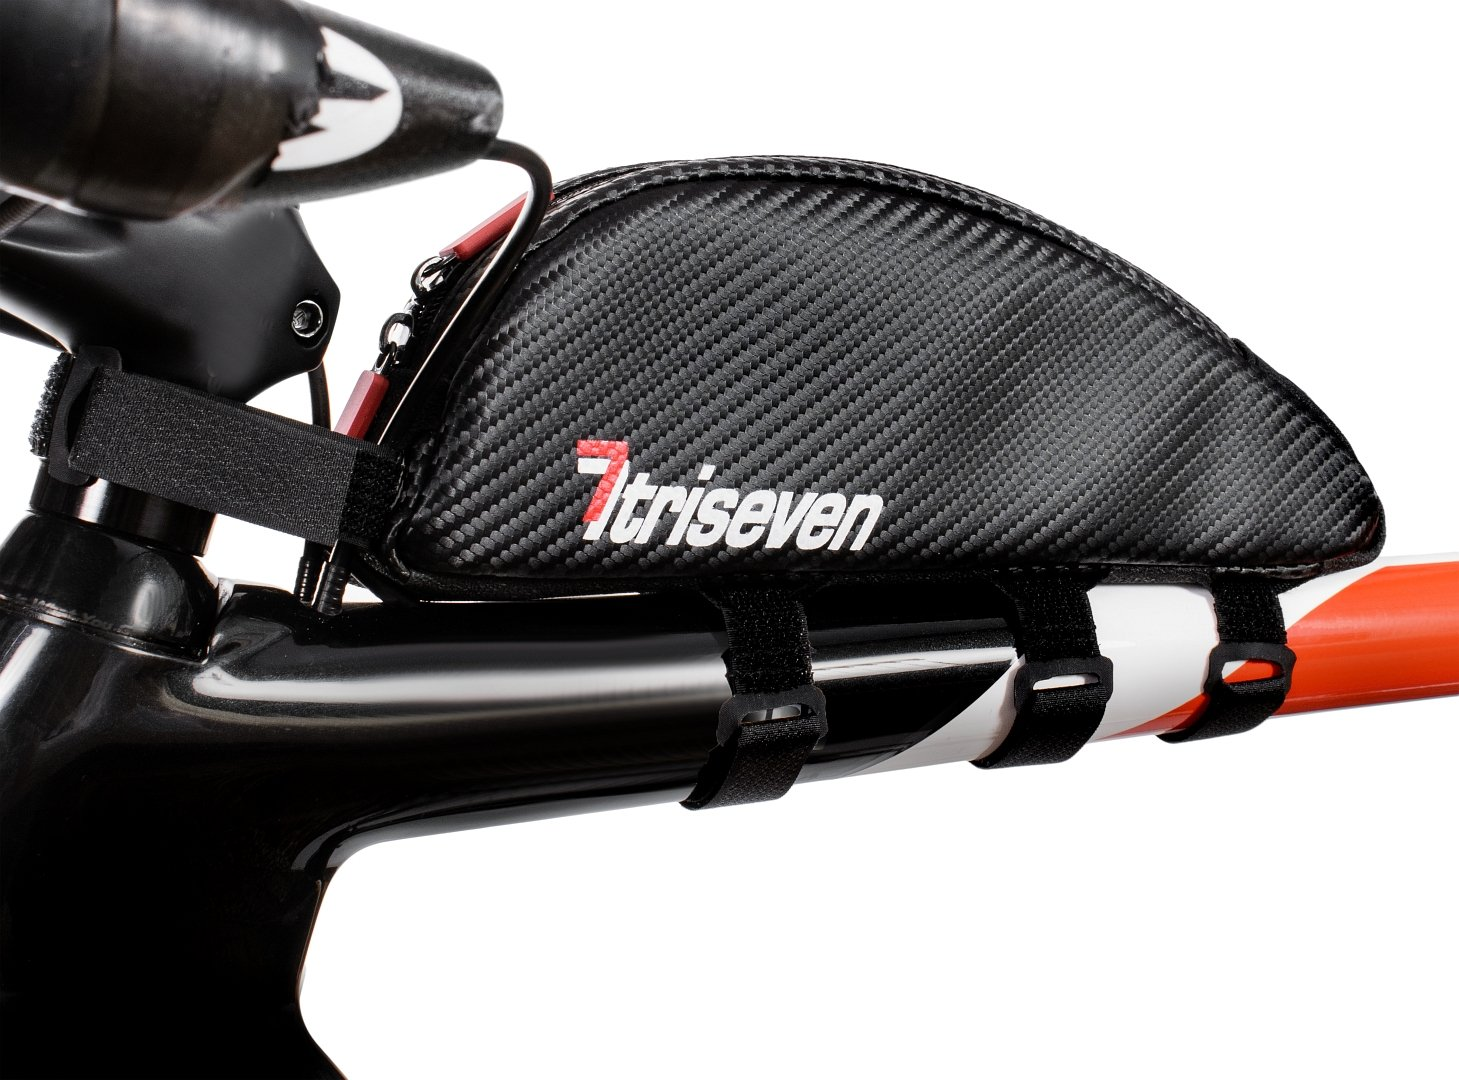 TRISEVEN Carbon Aero Bag 30 * Bolsa de ciclismo Frame * Triatlón Bag * MTB Bag * Capacidad de combustible, iPhone PLUS, herramientas * Bolsa de tubo superior * Accesorios de bicicleta * 10 geles * 4 correas o 2 pernos * Agujero para auriculares * 100% gara